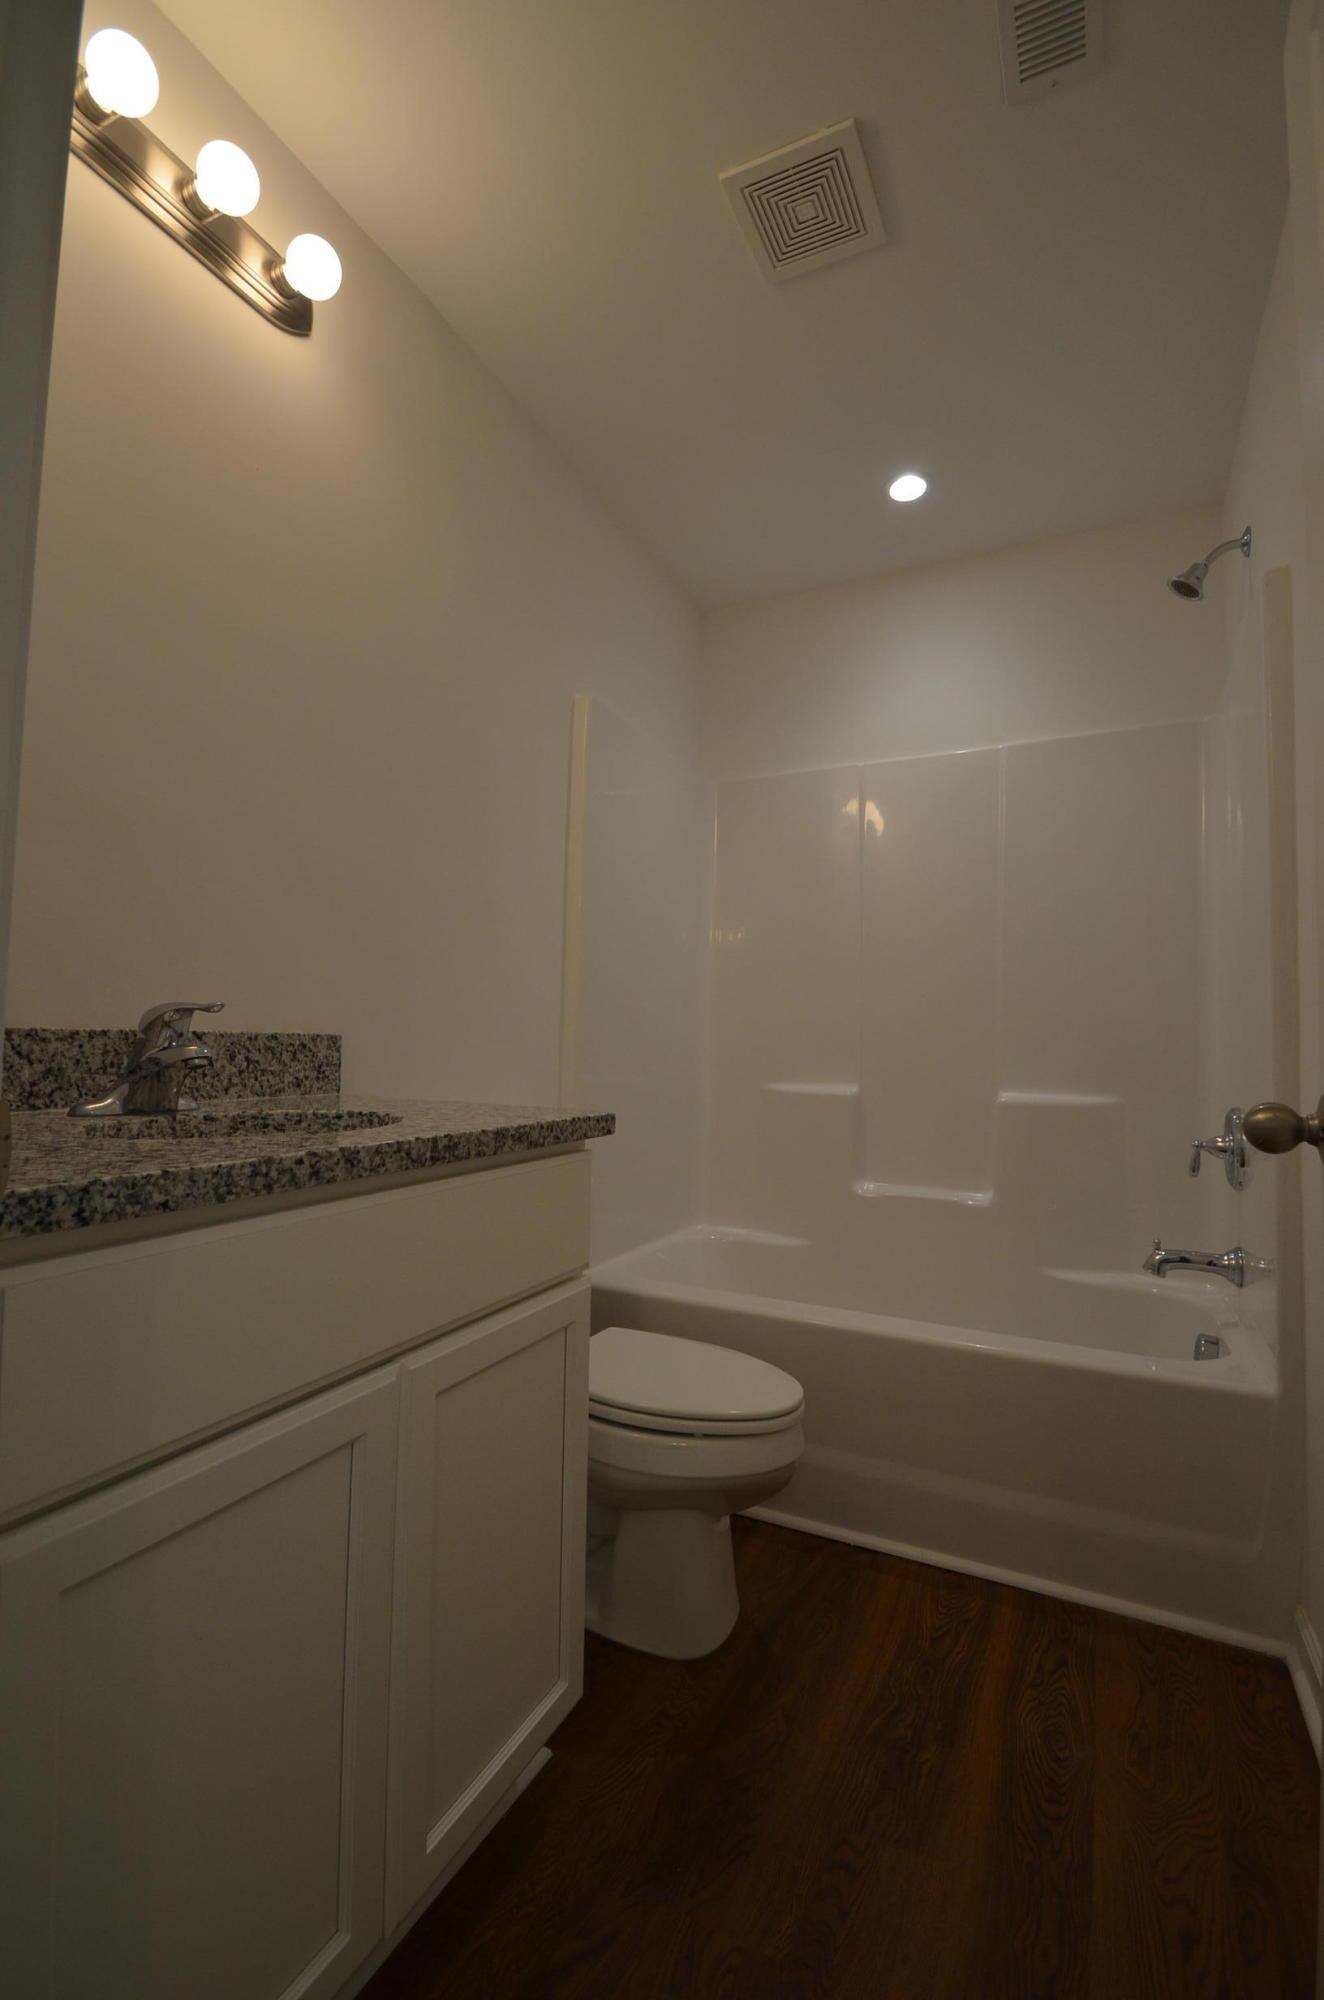 None Homes For Sale - 211 White, Moncks Corner, SC - 1